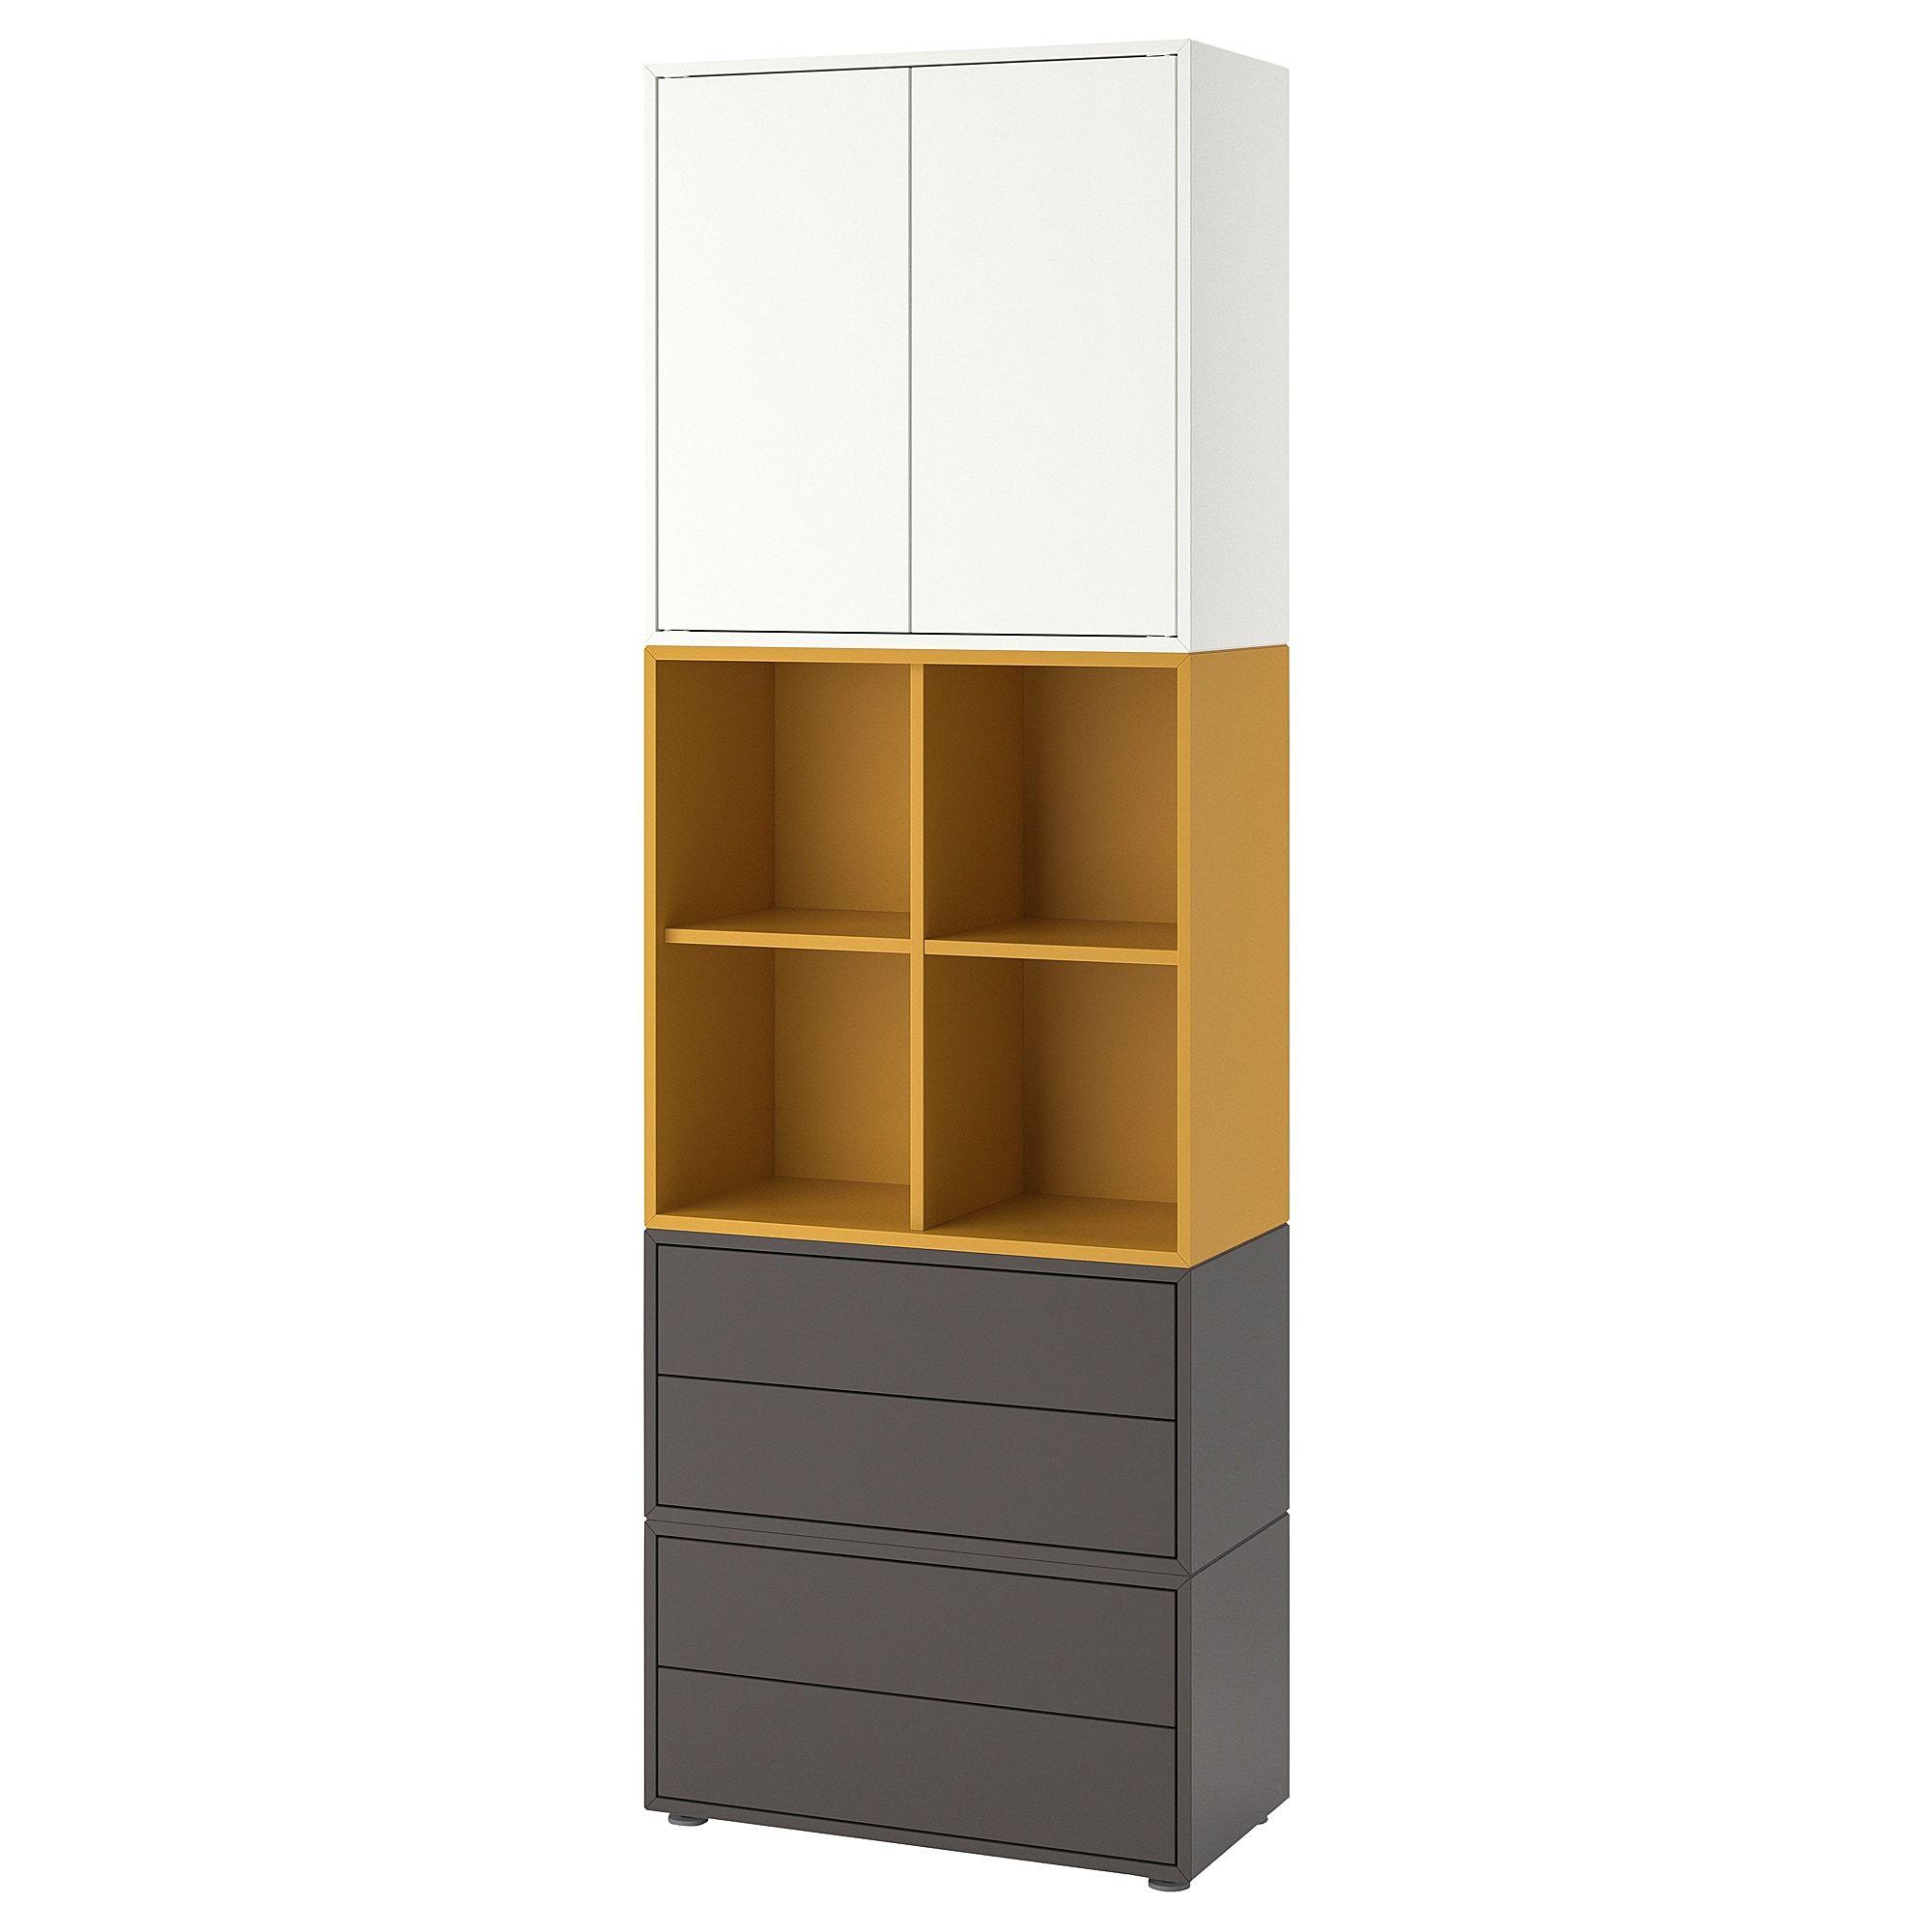 EKET Storage combination with feet, white, golden brown